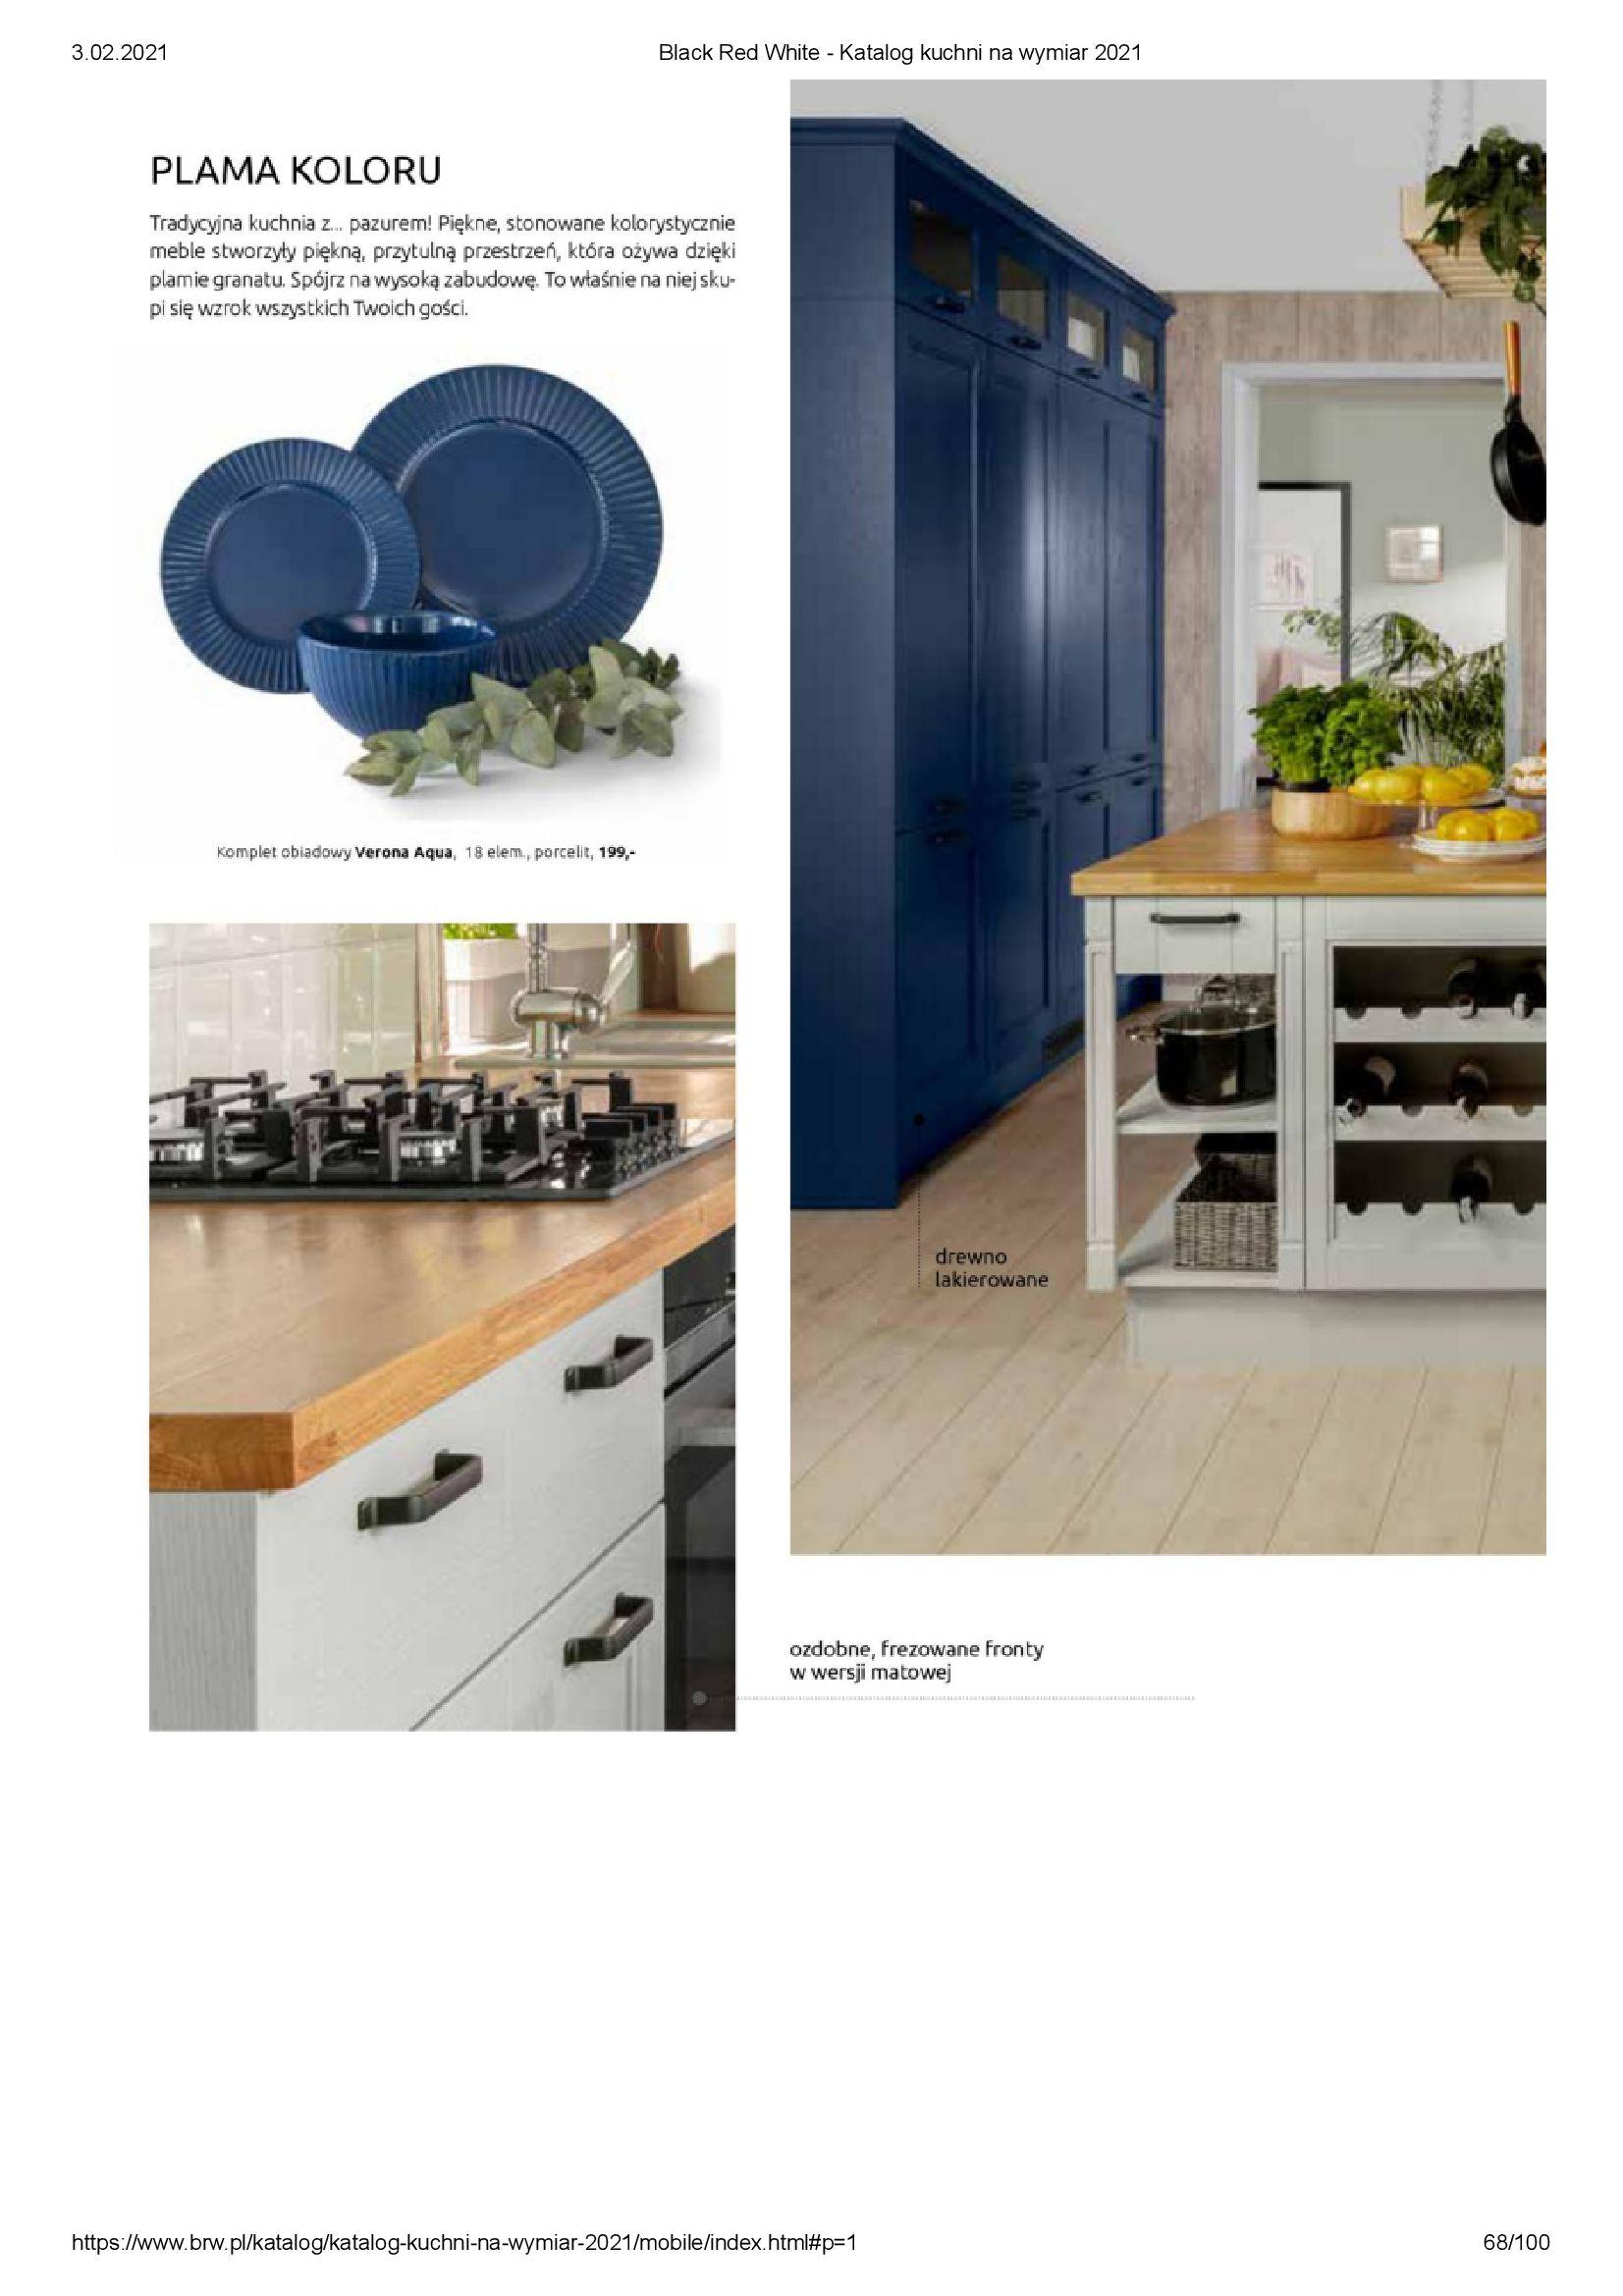 Gazetka Black Red White: Katalog - Kuchnie na wymiar Senso Kitchens 2021 2021-01-01 page-68